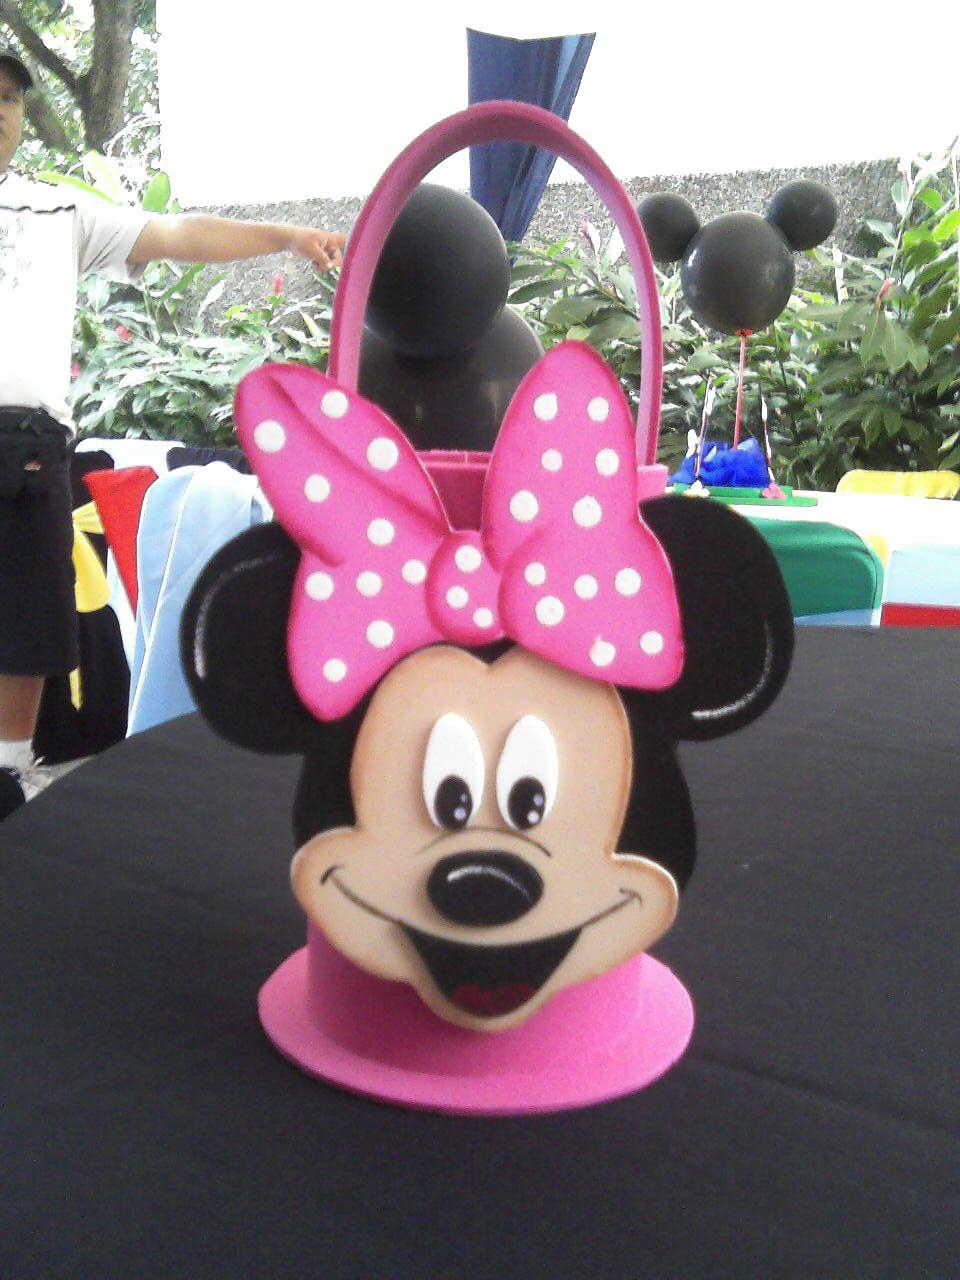 Cotillon+Minnie+-+La+casa+de+Mickey.jpg (960×1280) | lembrancinhS ...